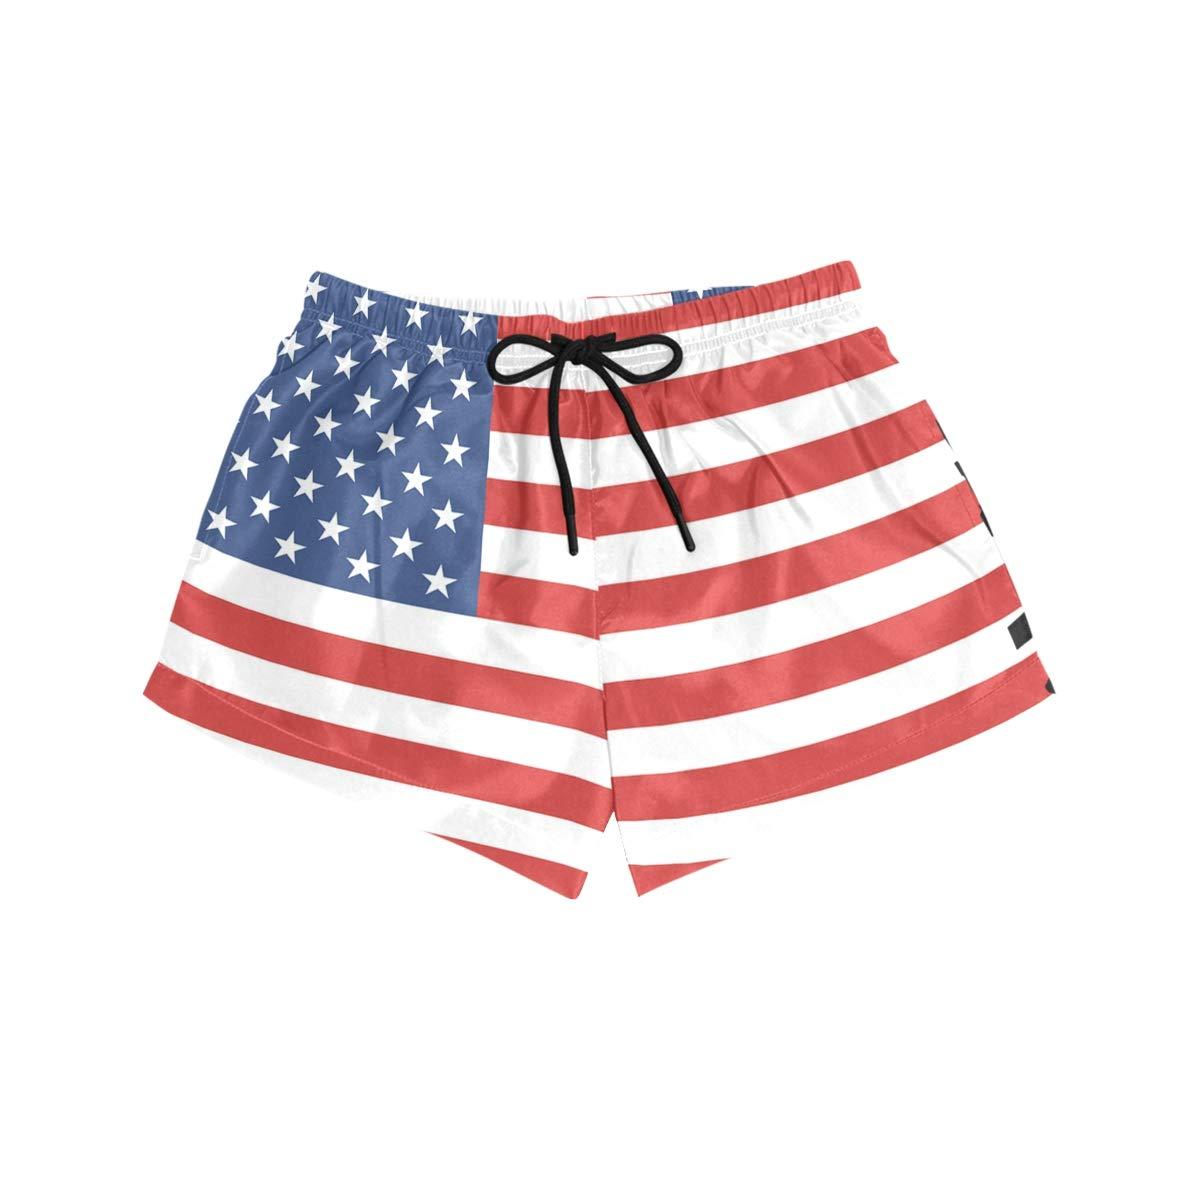 MALPLENA Womens Board Shorts American Flag Quick Dry Beach Boardshorts